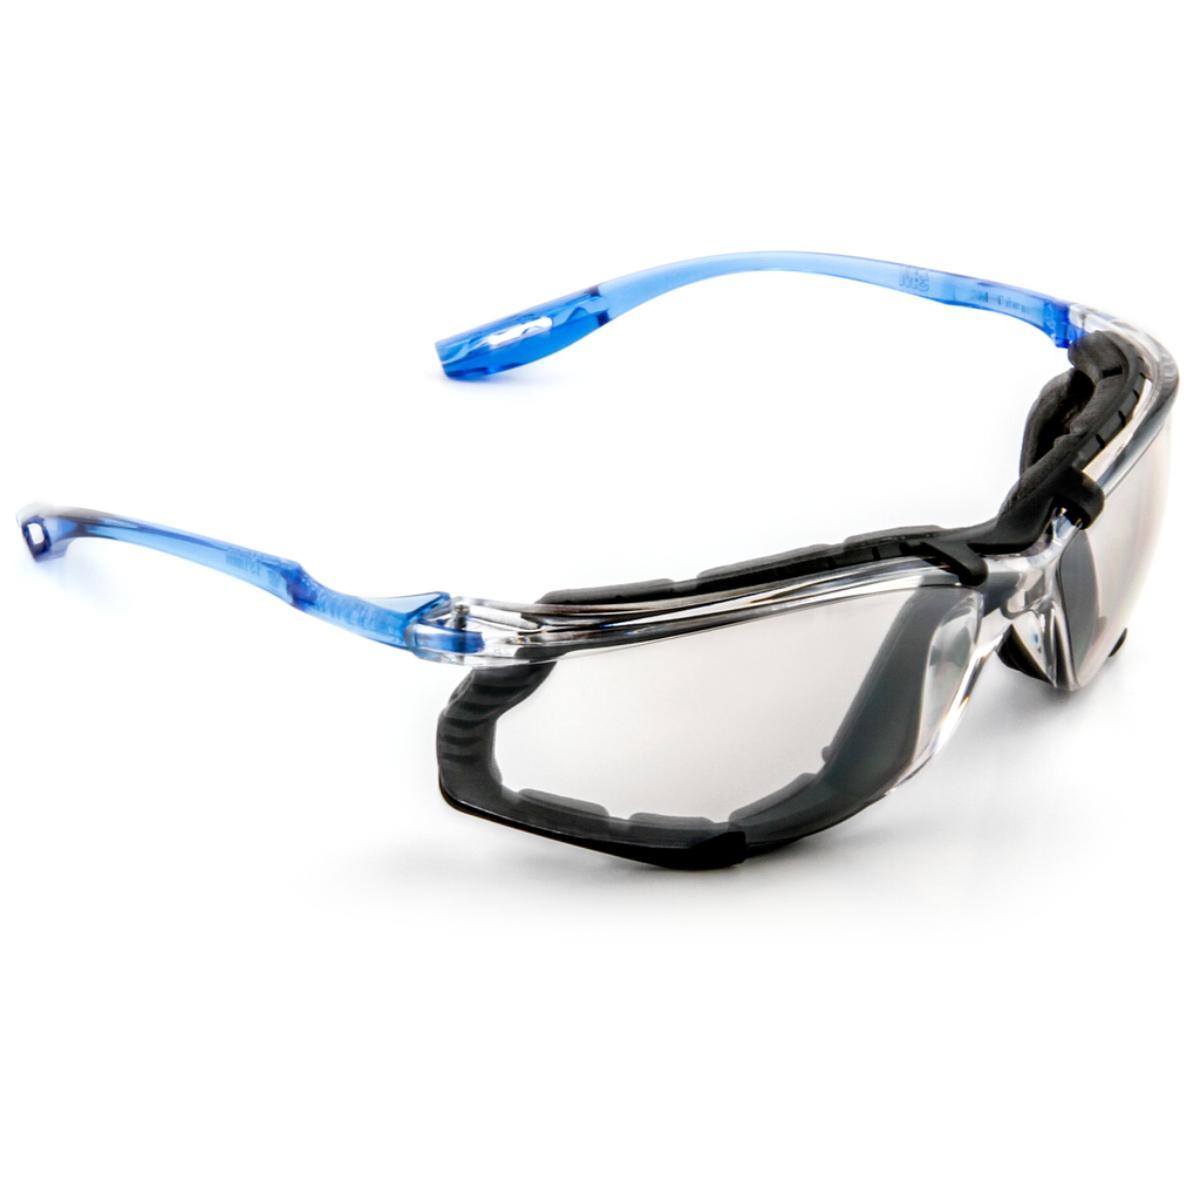 "3Mâ""¢ Virtuaâ""¢ CCS Protective Eyewear 11874-00000-20, with Foam Gasket,  I/O Mir Anti-Fog Lens,"